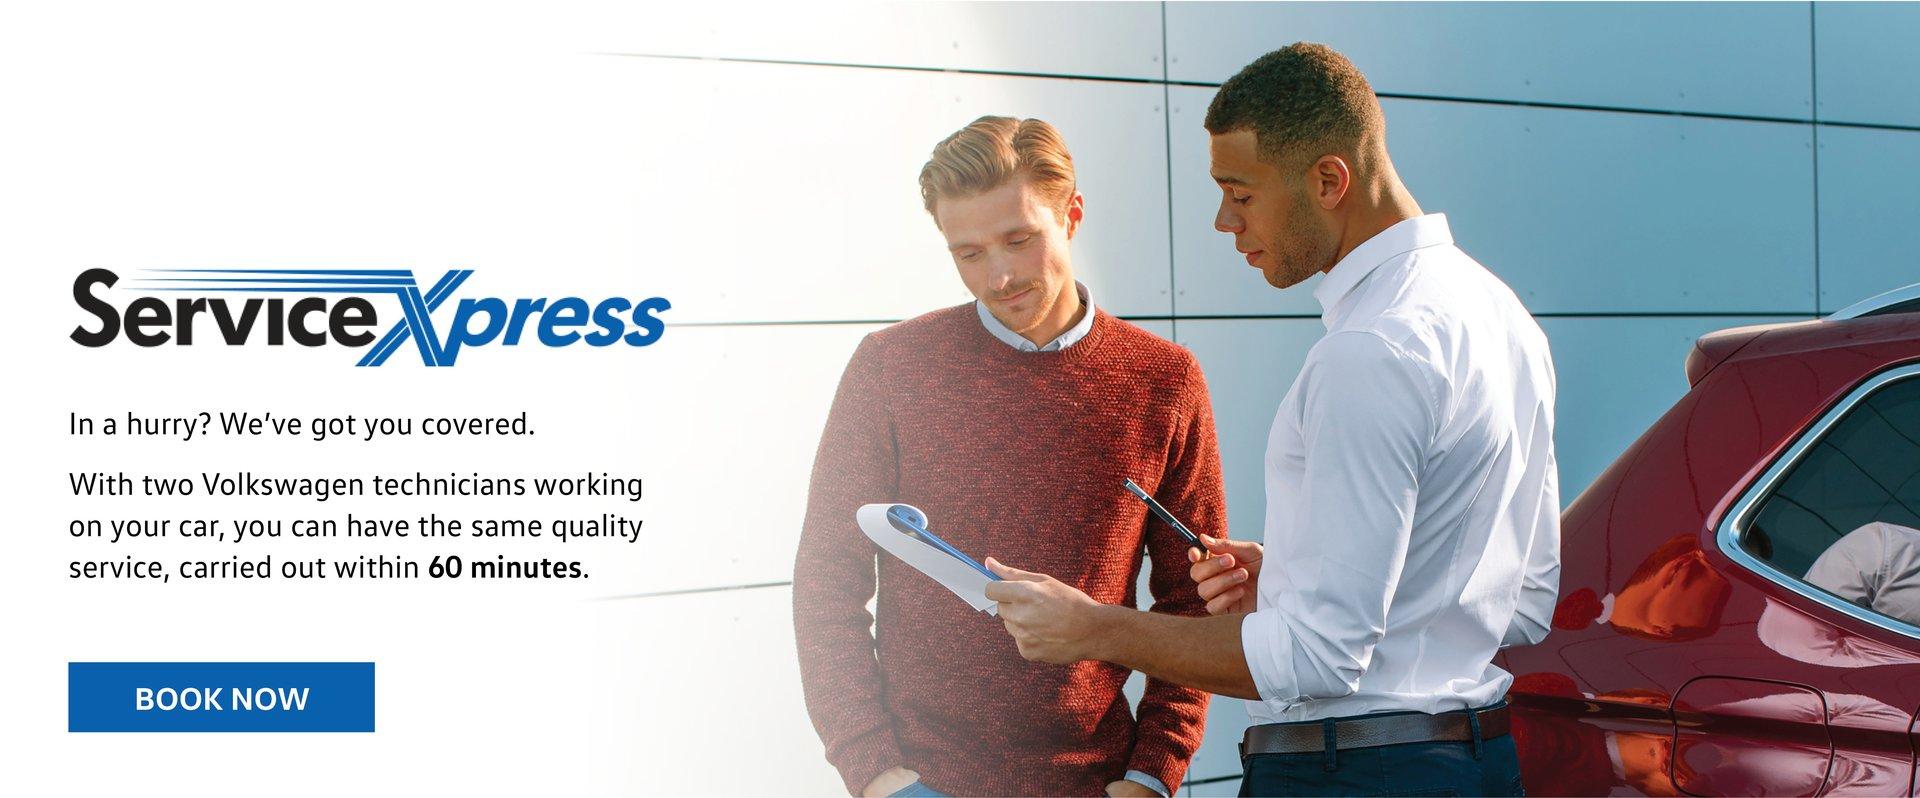 McCarroll's Service Xpress